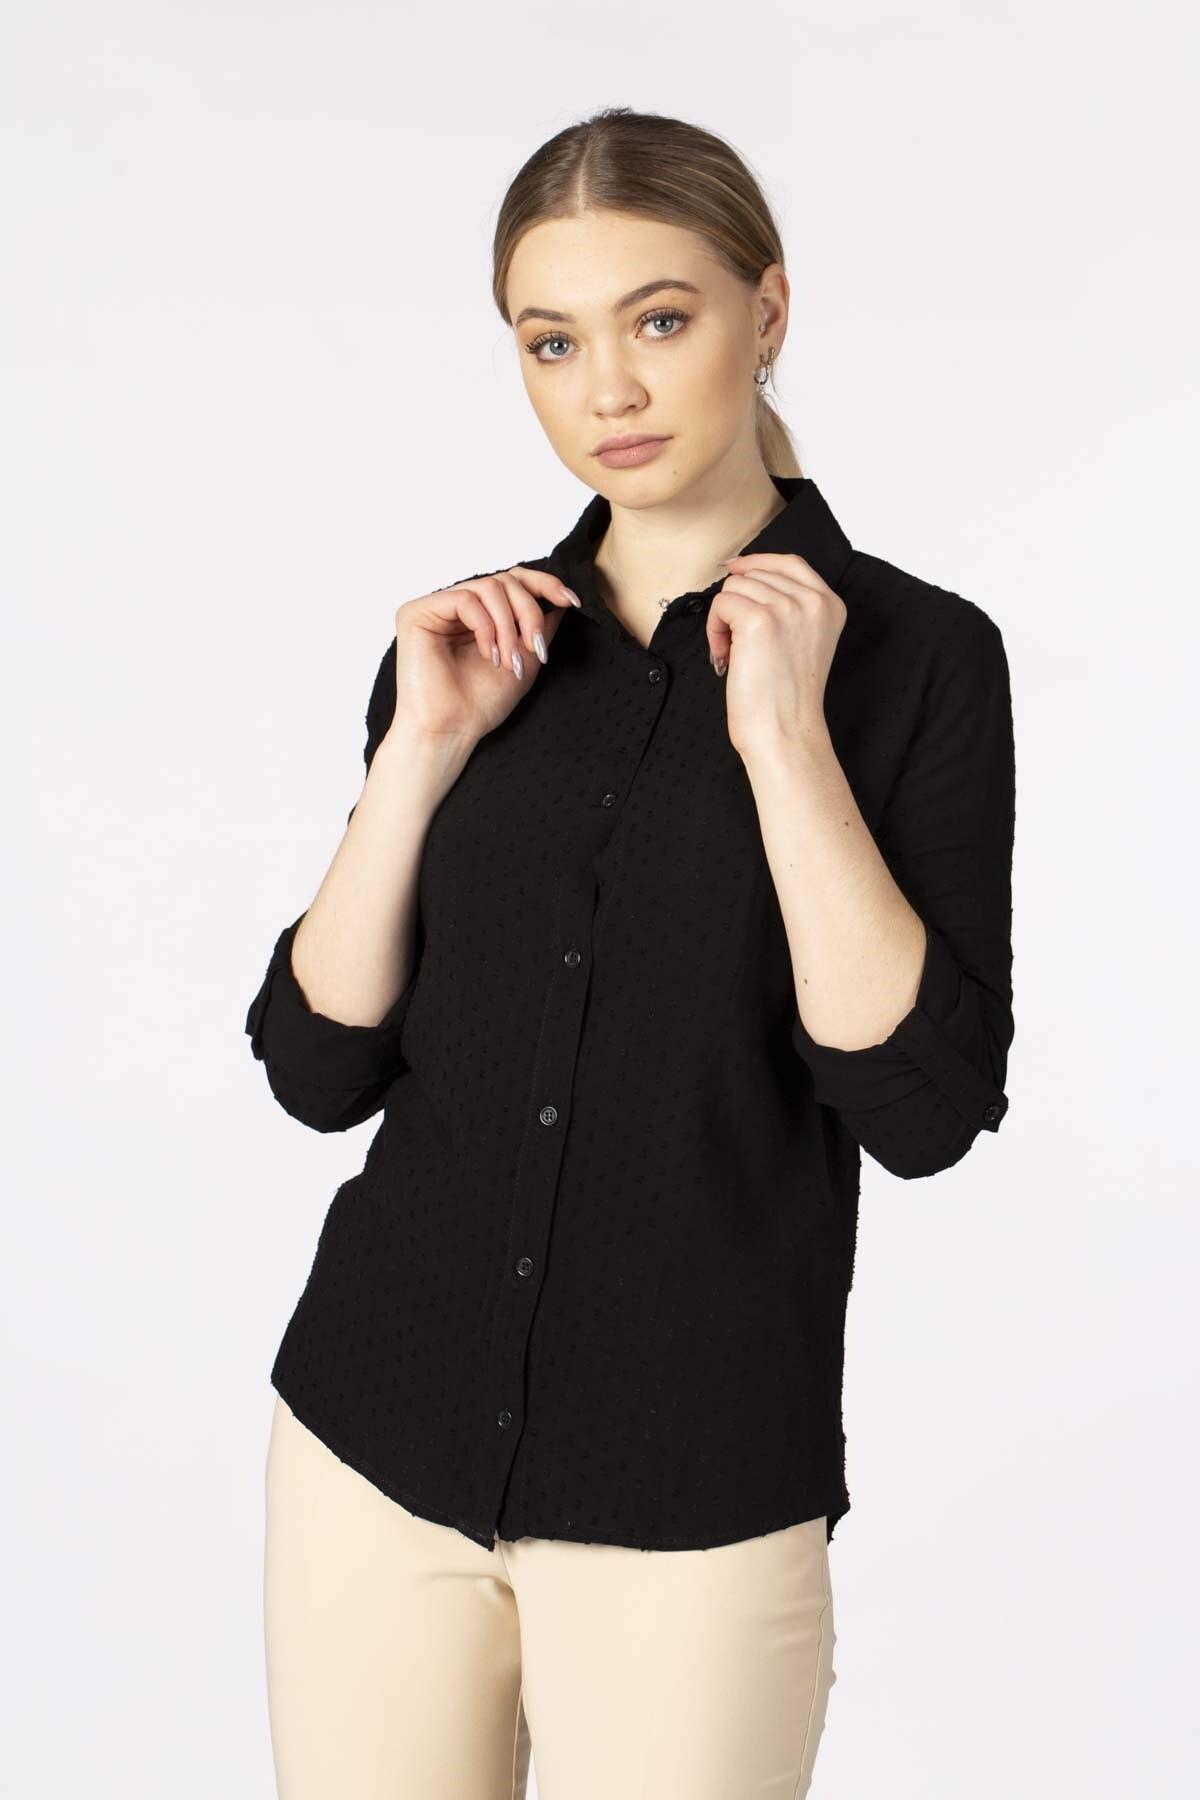 BARRELS AND OIL Kadın Siyah Ponponlu Gömlek 692-20Y03002.91